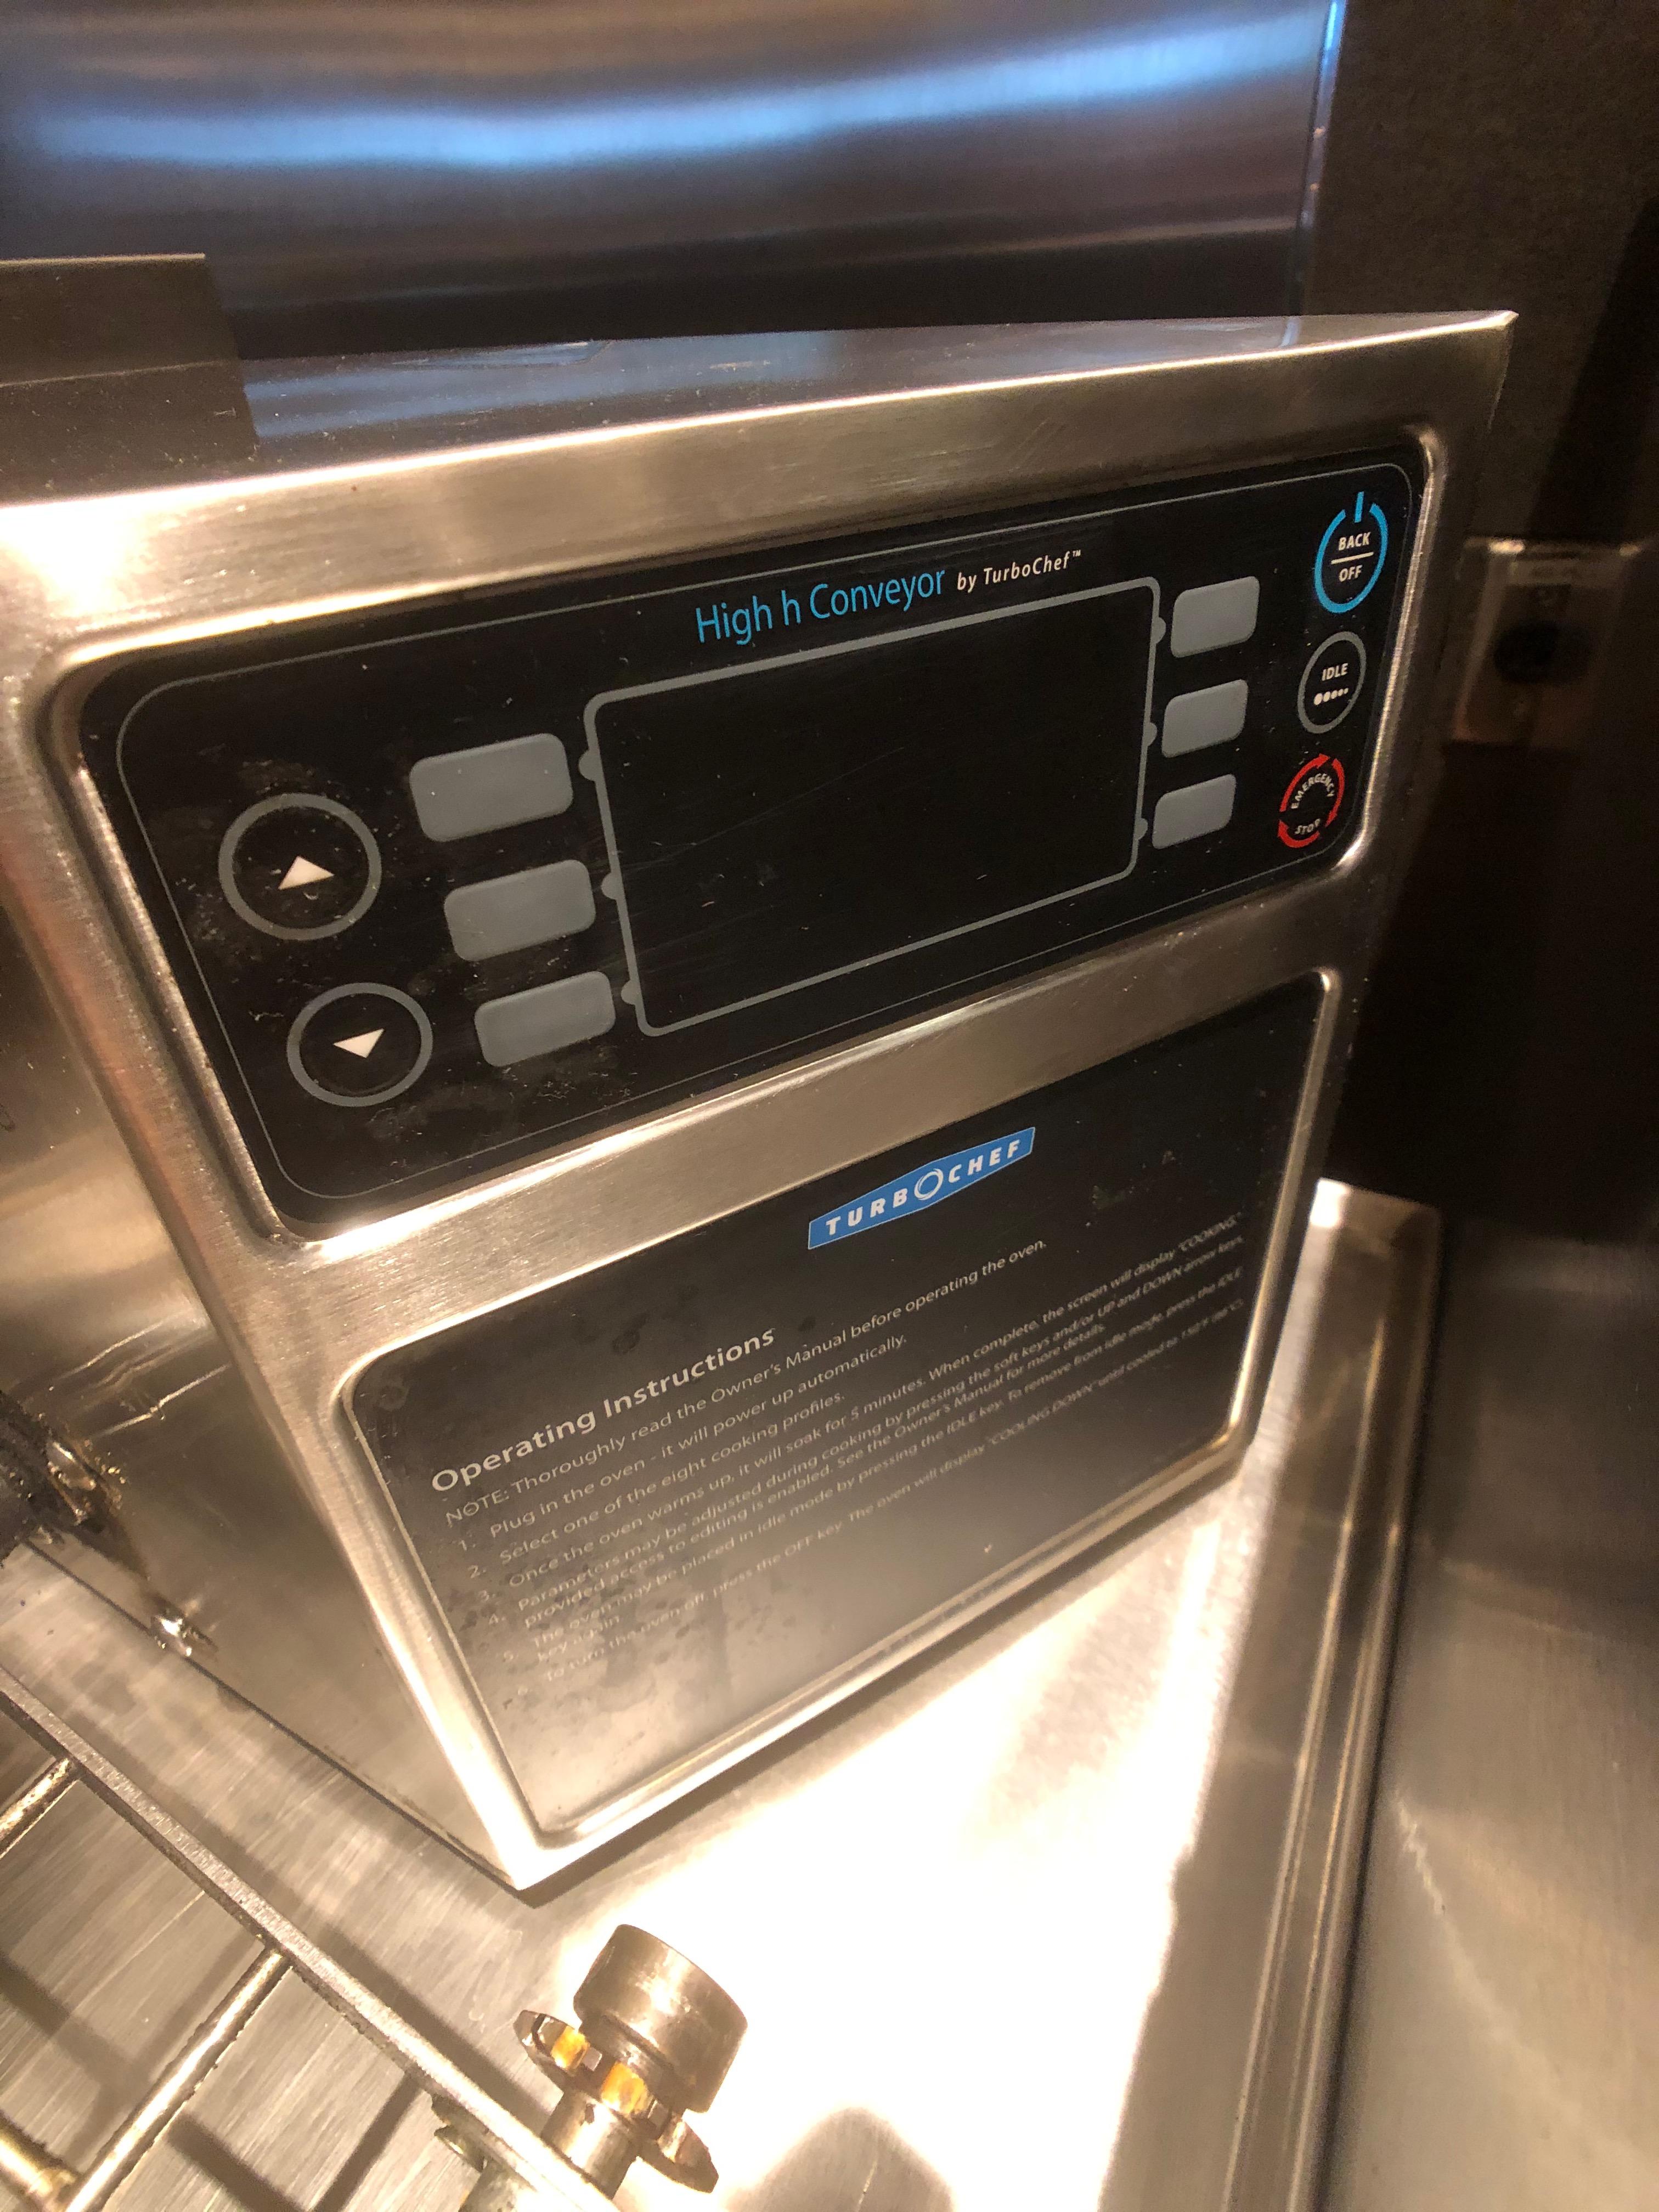 TurboChef Conveyor Oven, Model HHC2020, S/N HHC2020ED06665 - Image 5 of 7